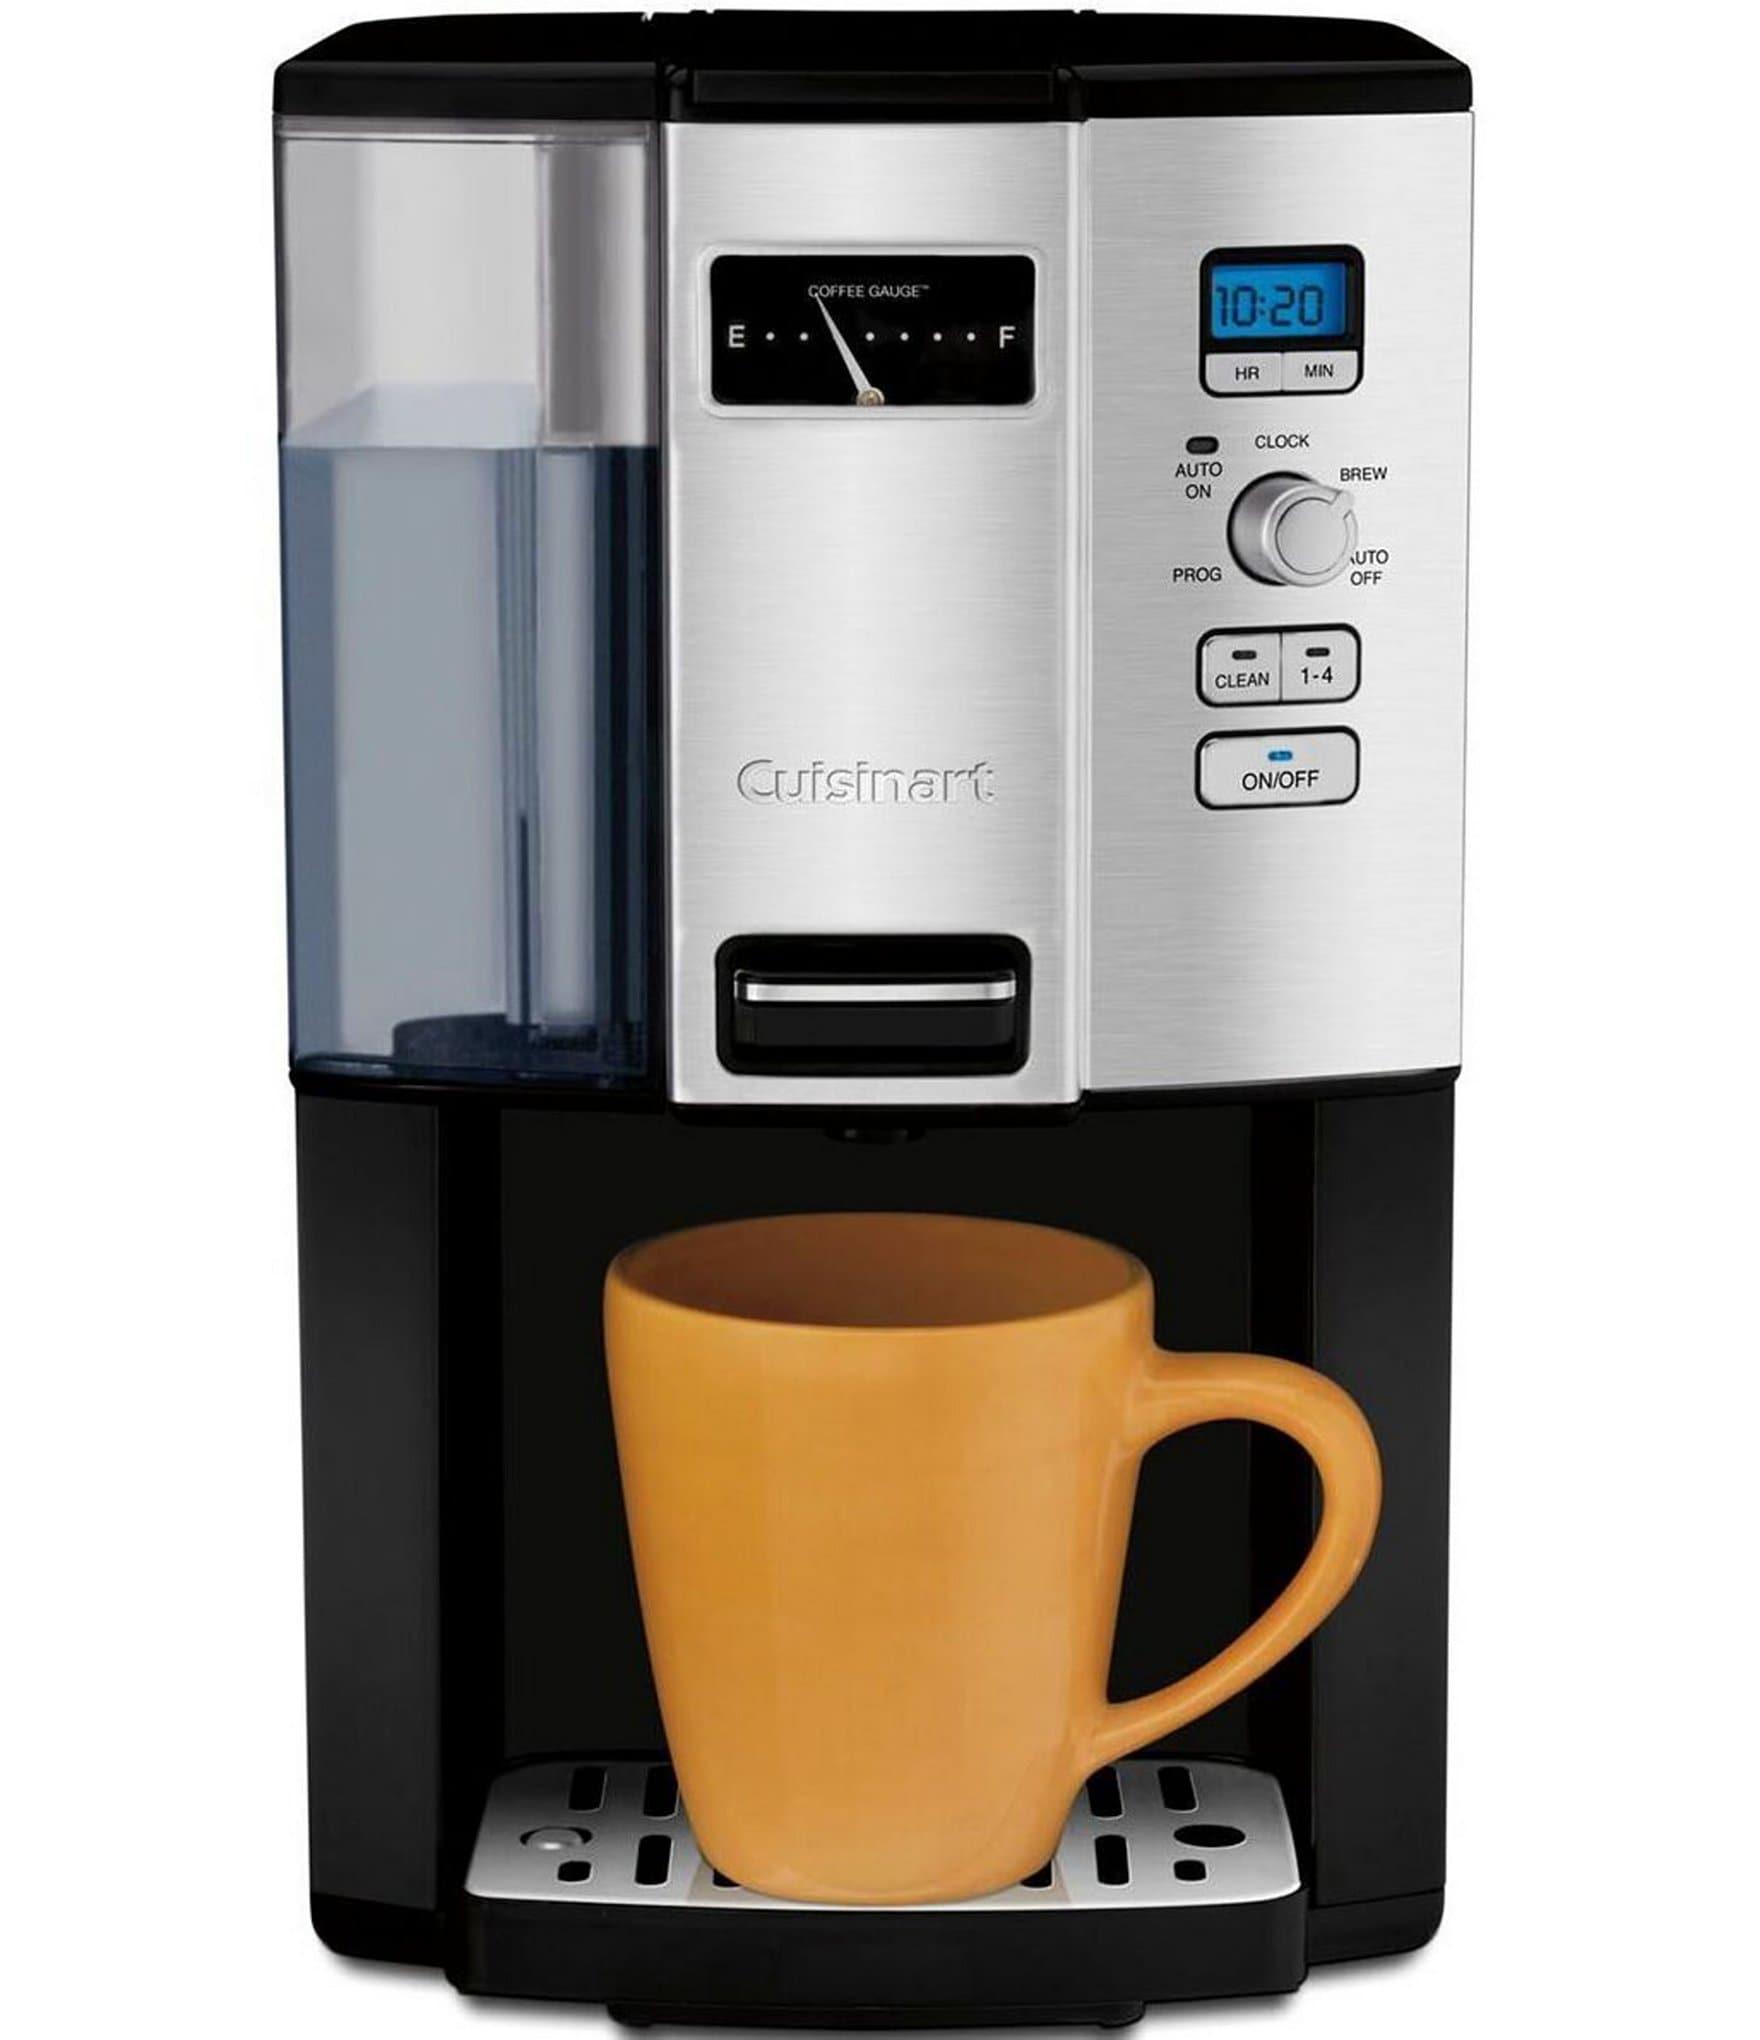 Cuisinart Coffee On Demand Programmable Single-Serve Coffee Maker Dillards